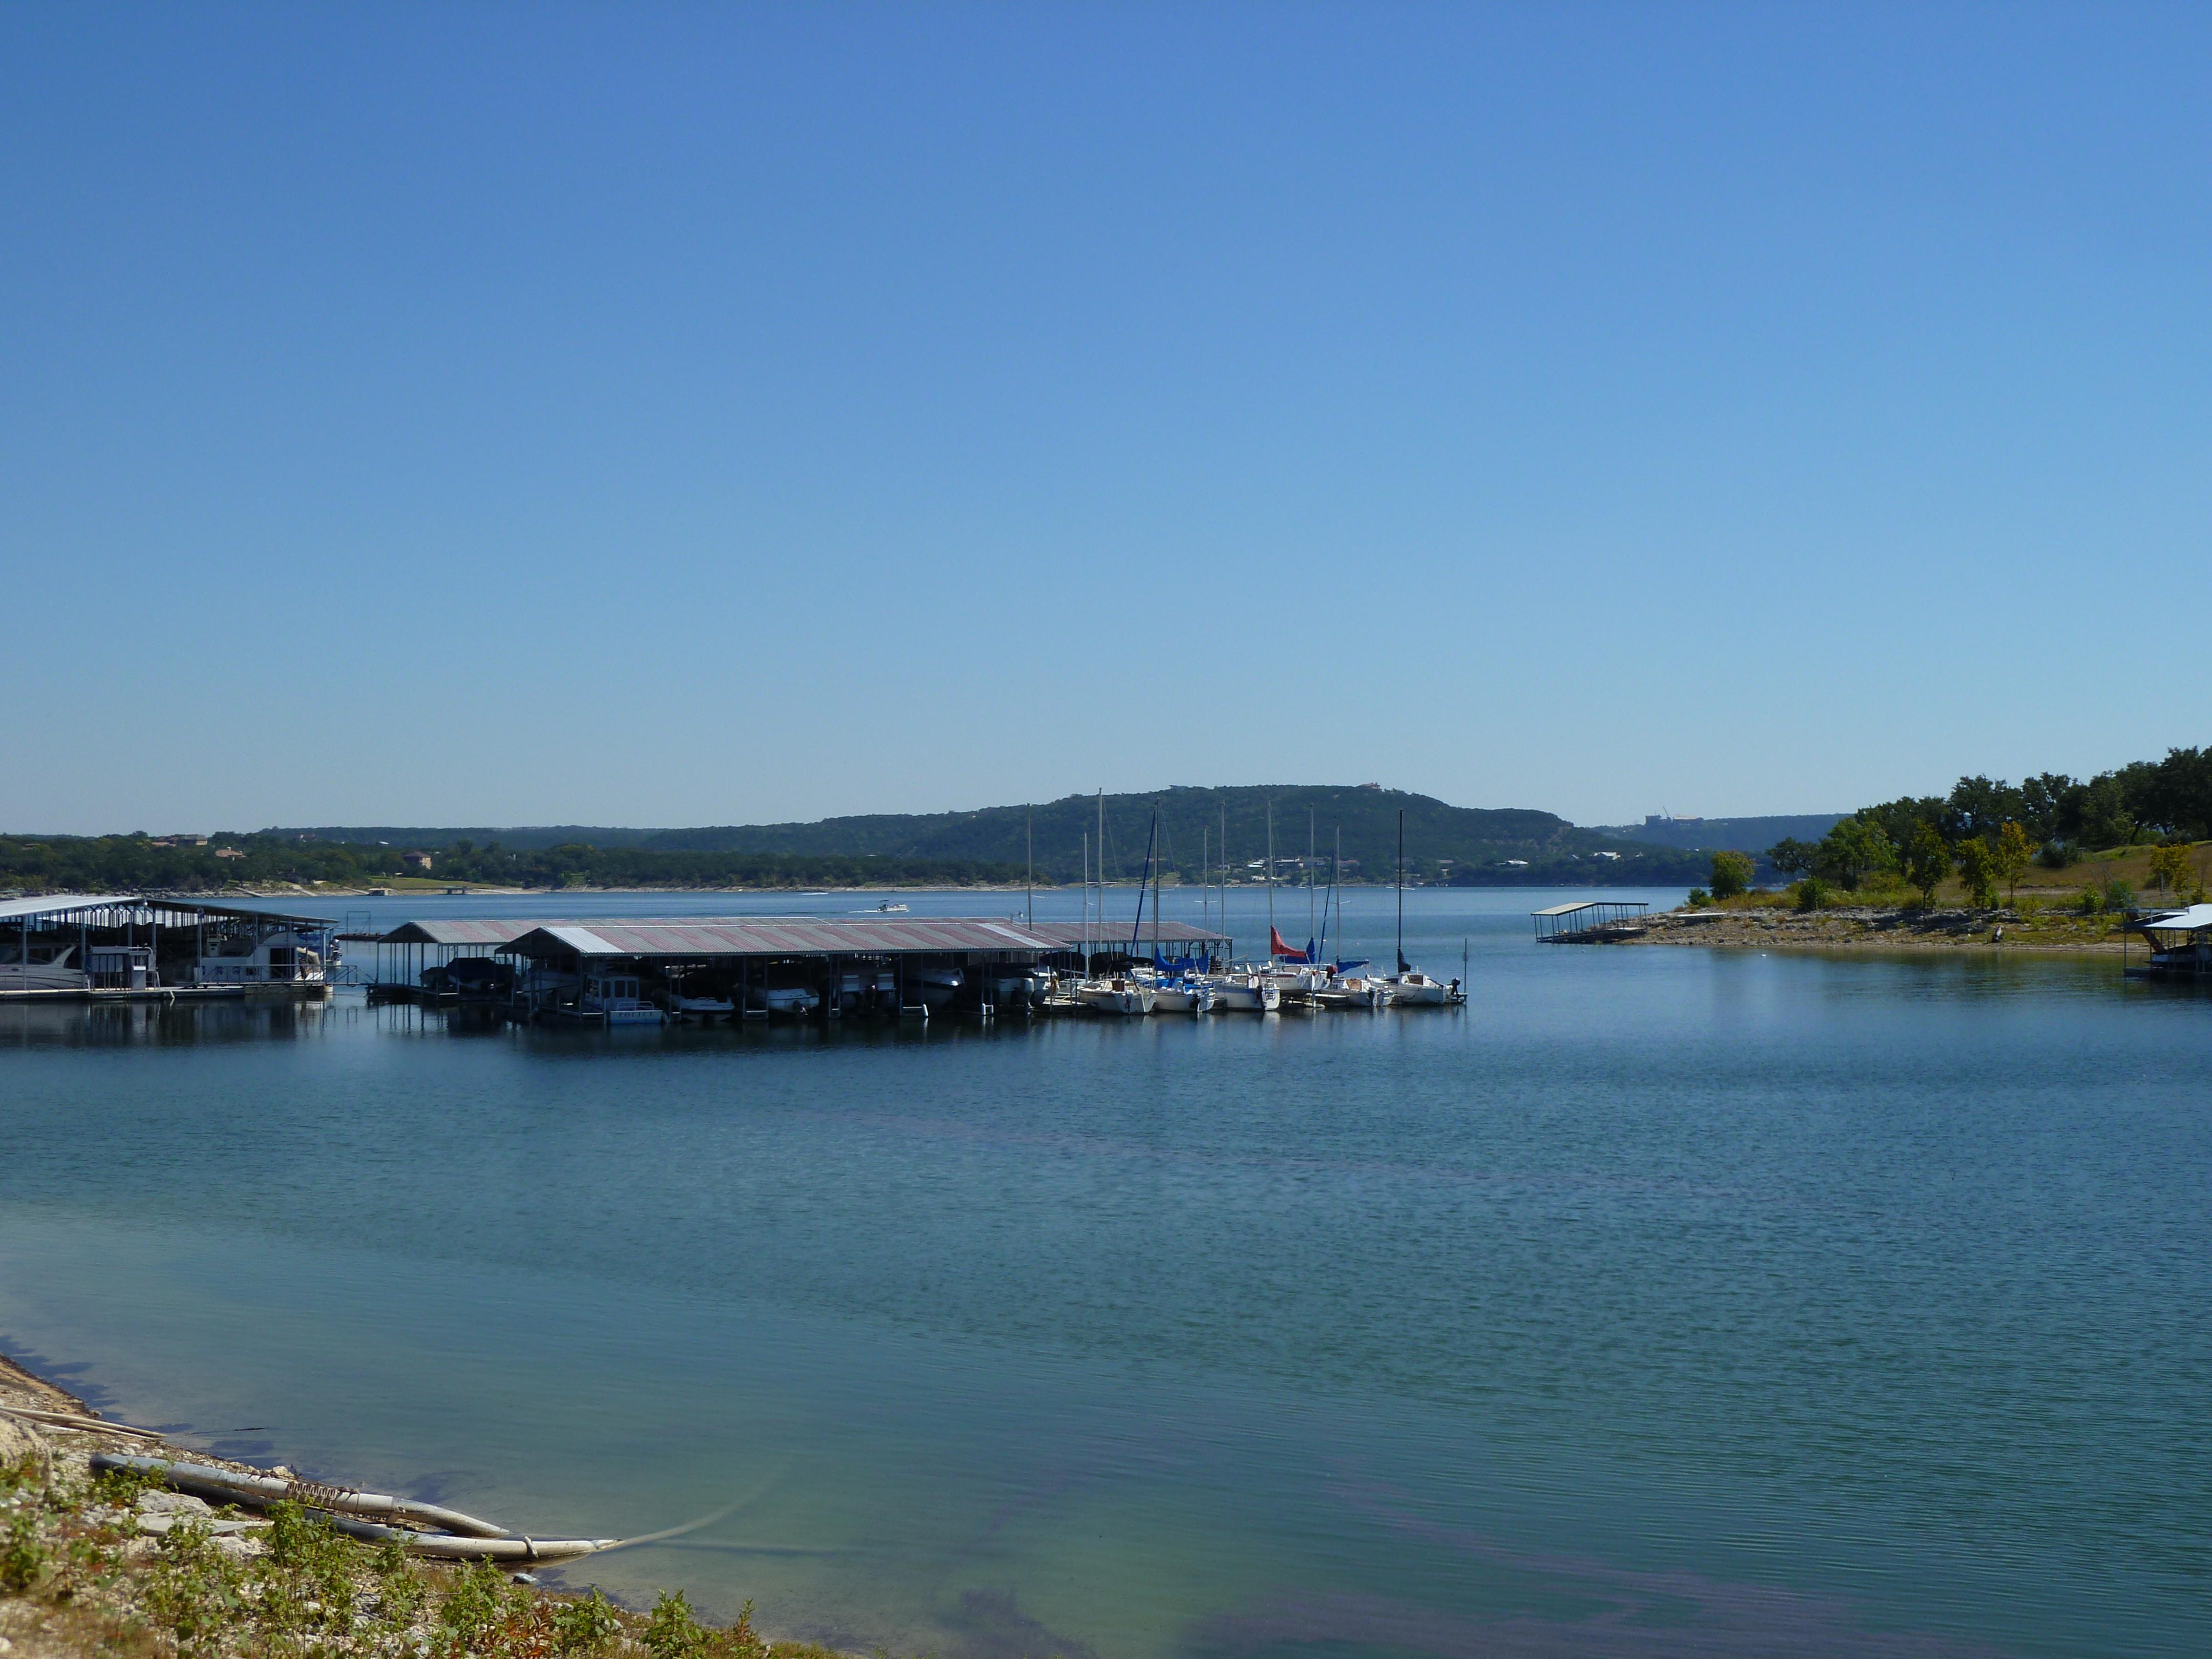 26. Lake Travis Marina